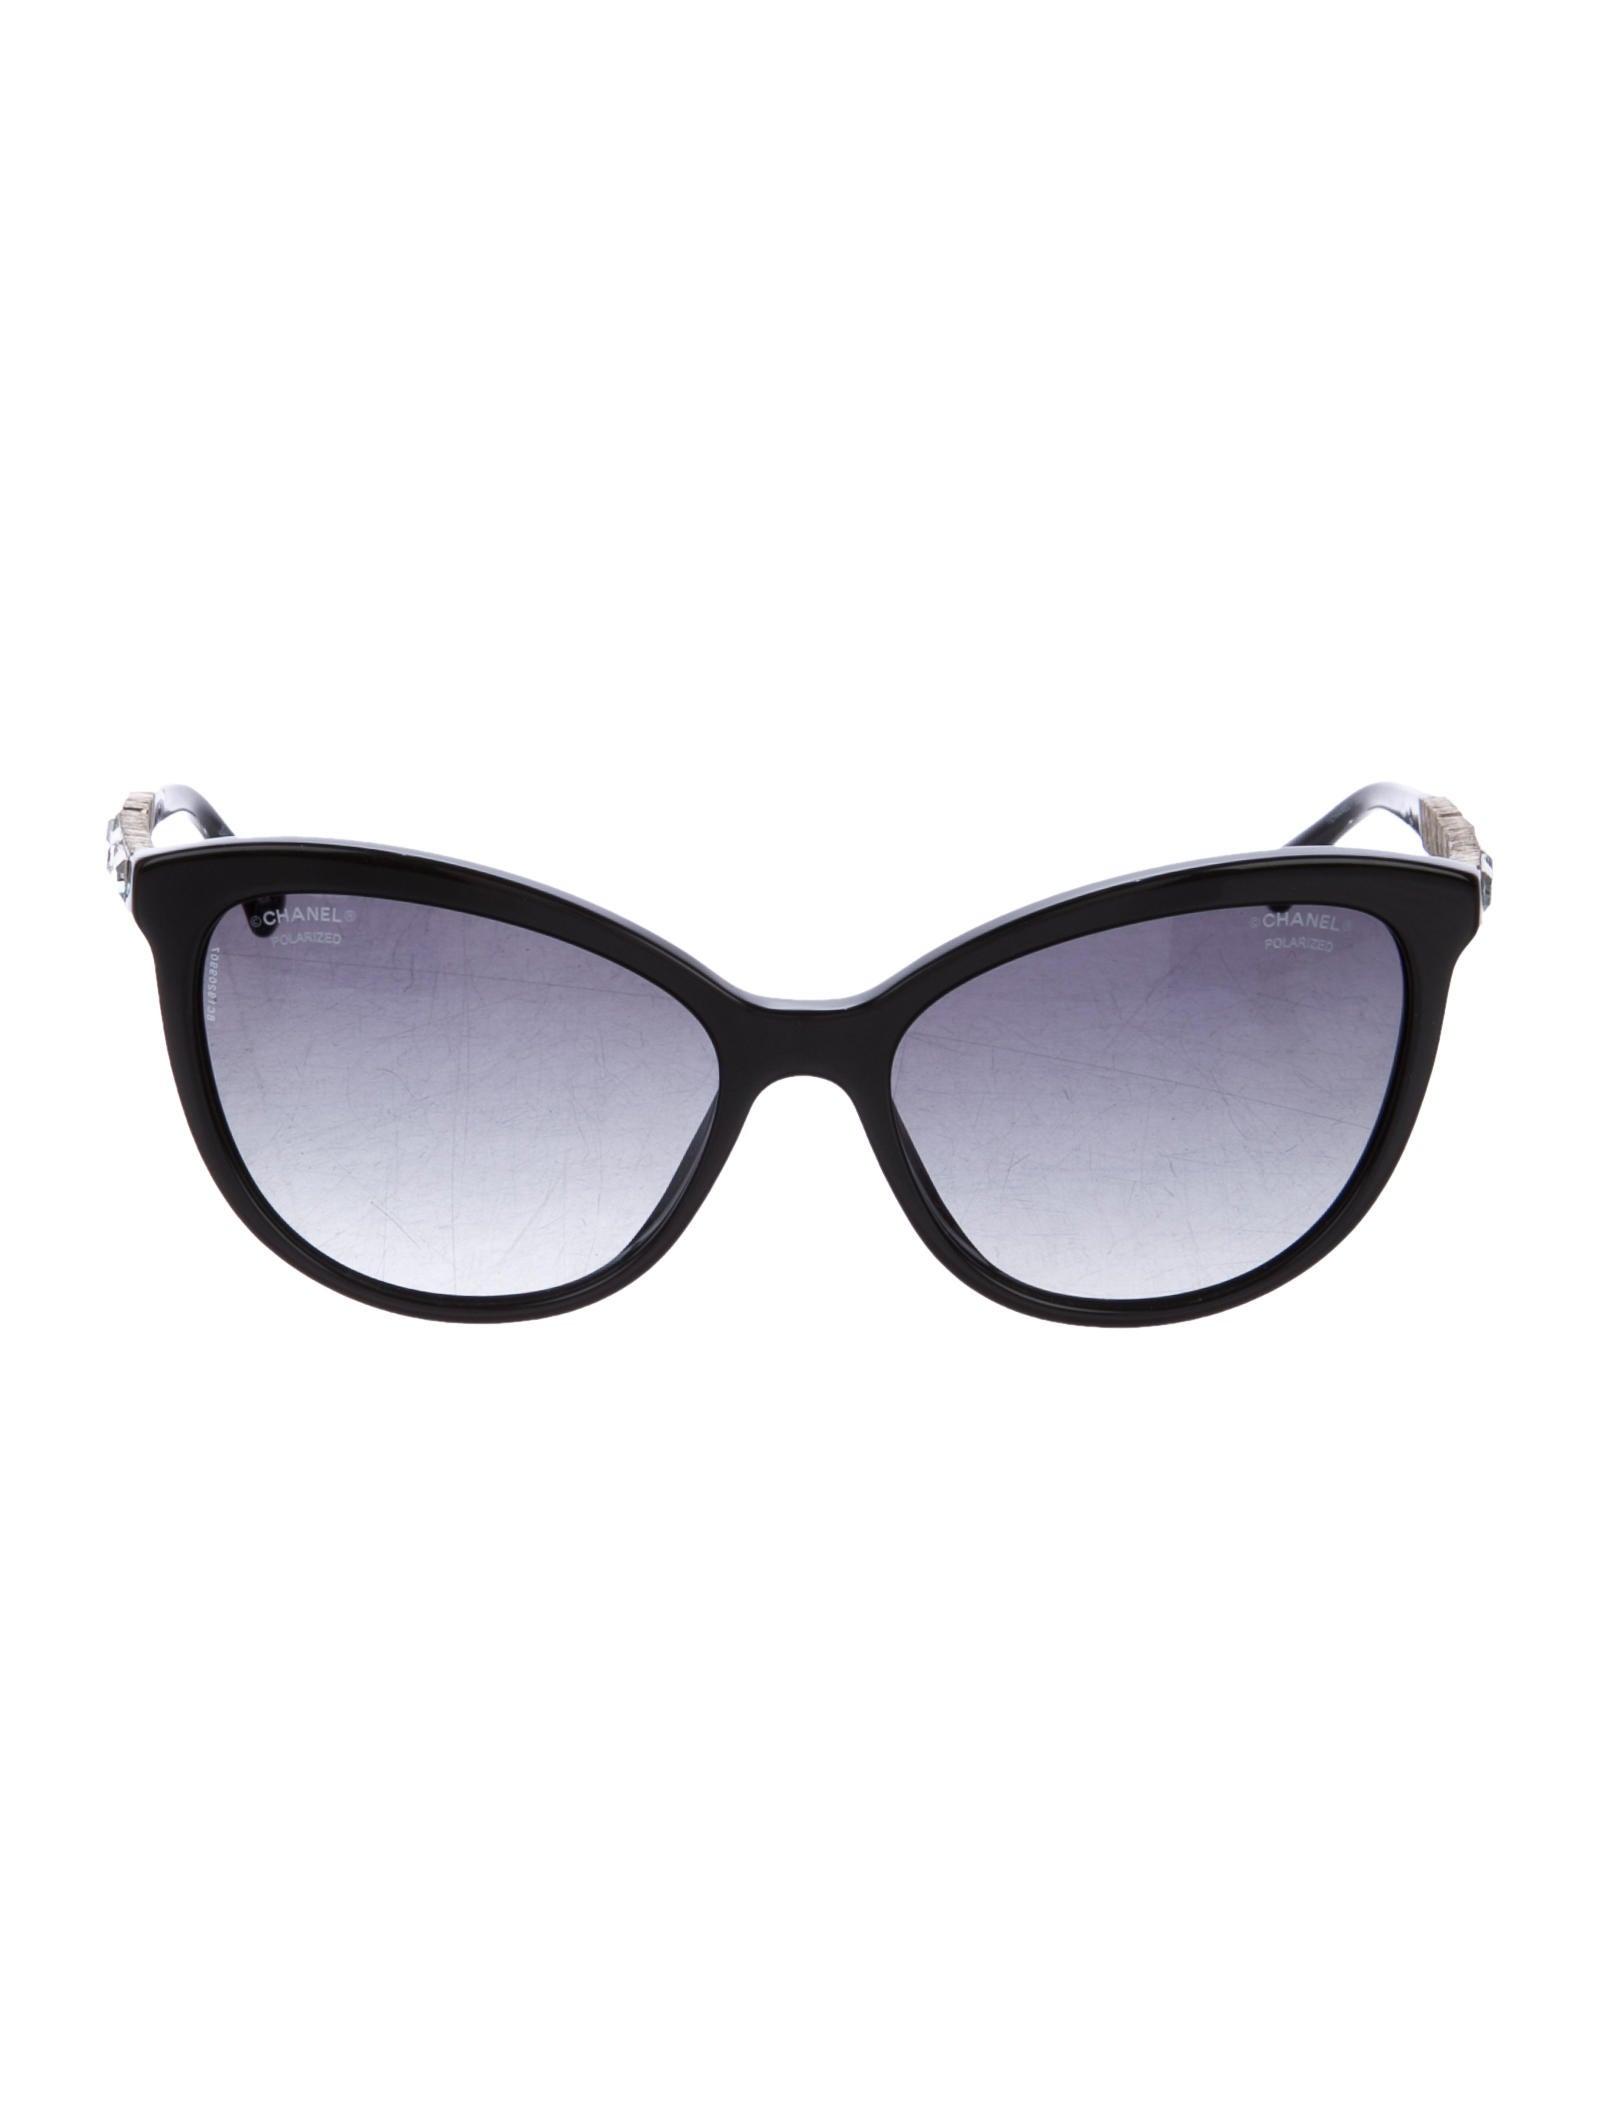 b924f338bb Chanel Bijou Cat-Eye Sunglasses - Accessories - CHA192557